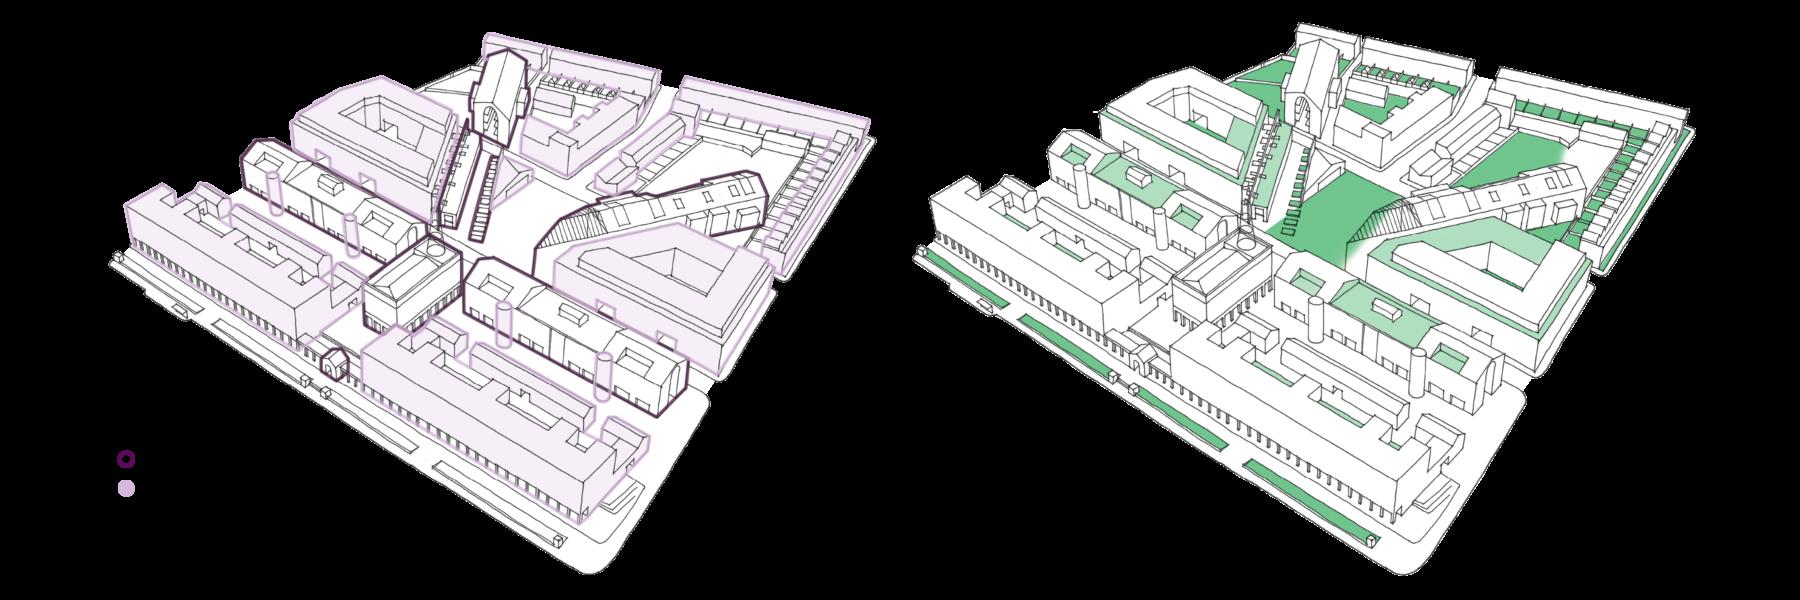 Sarah-Wigglesworth-Architects Unlocking-Pentonville Aerial-View-Analysis Diagram